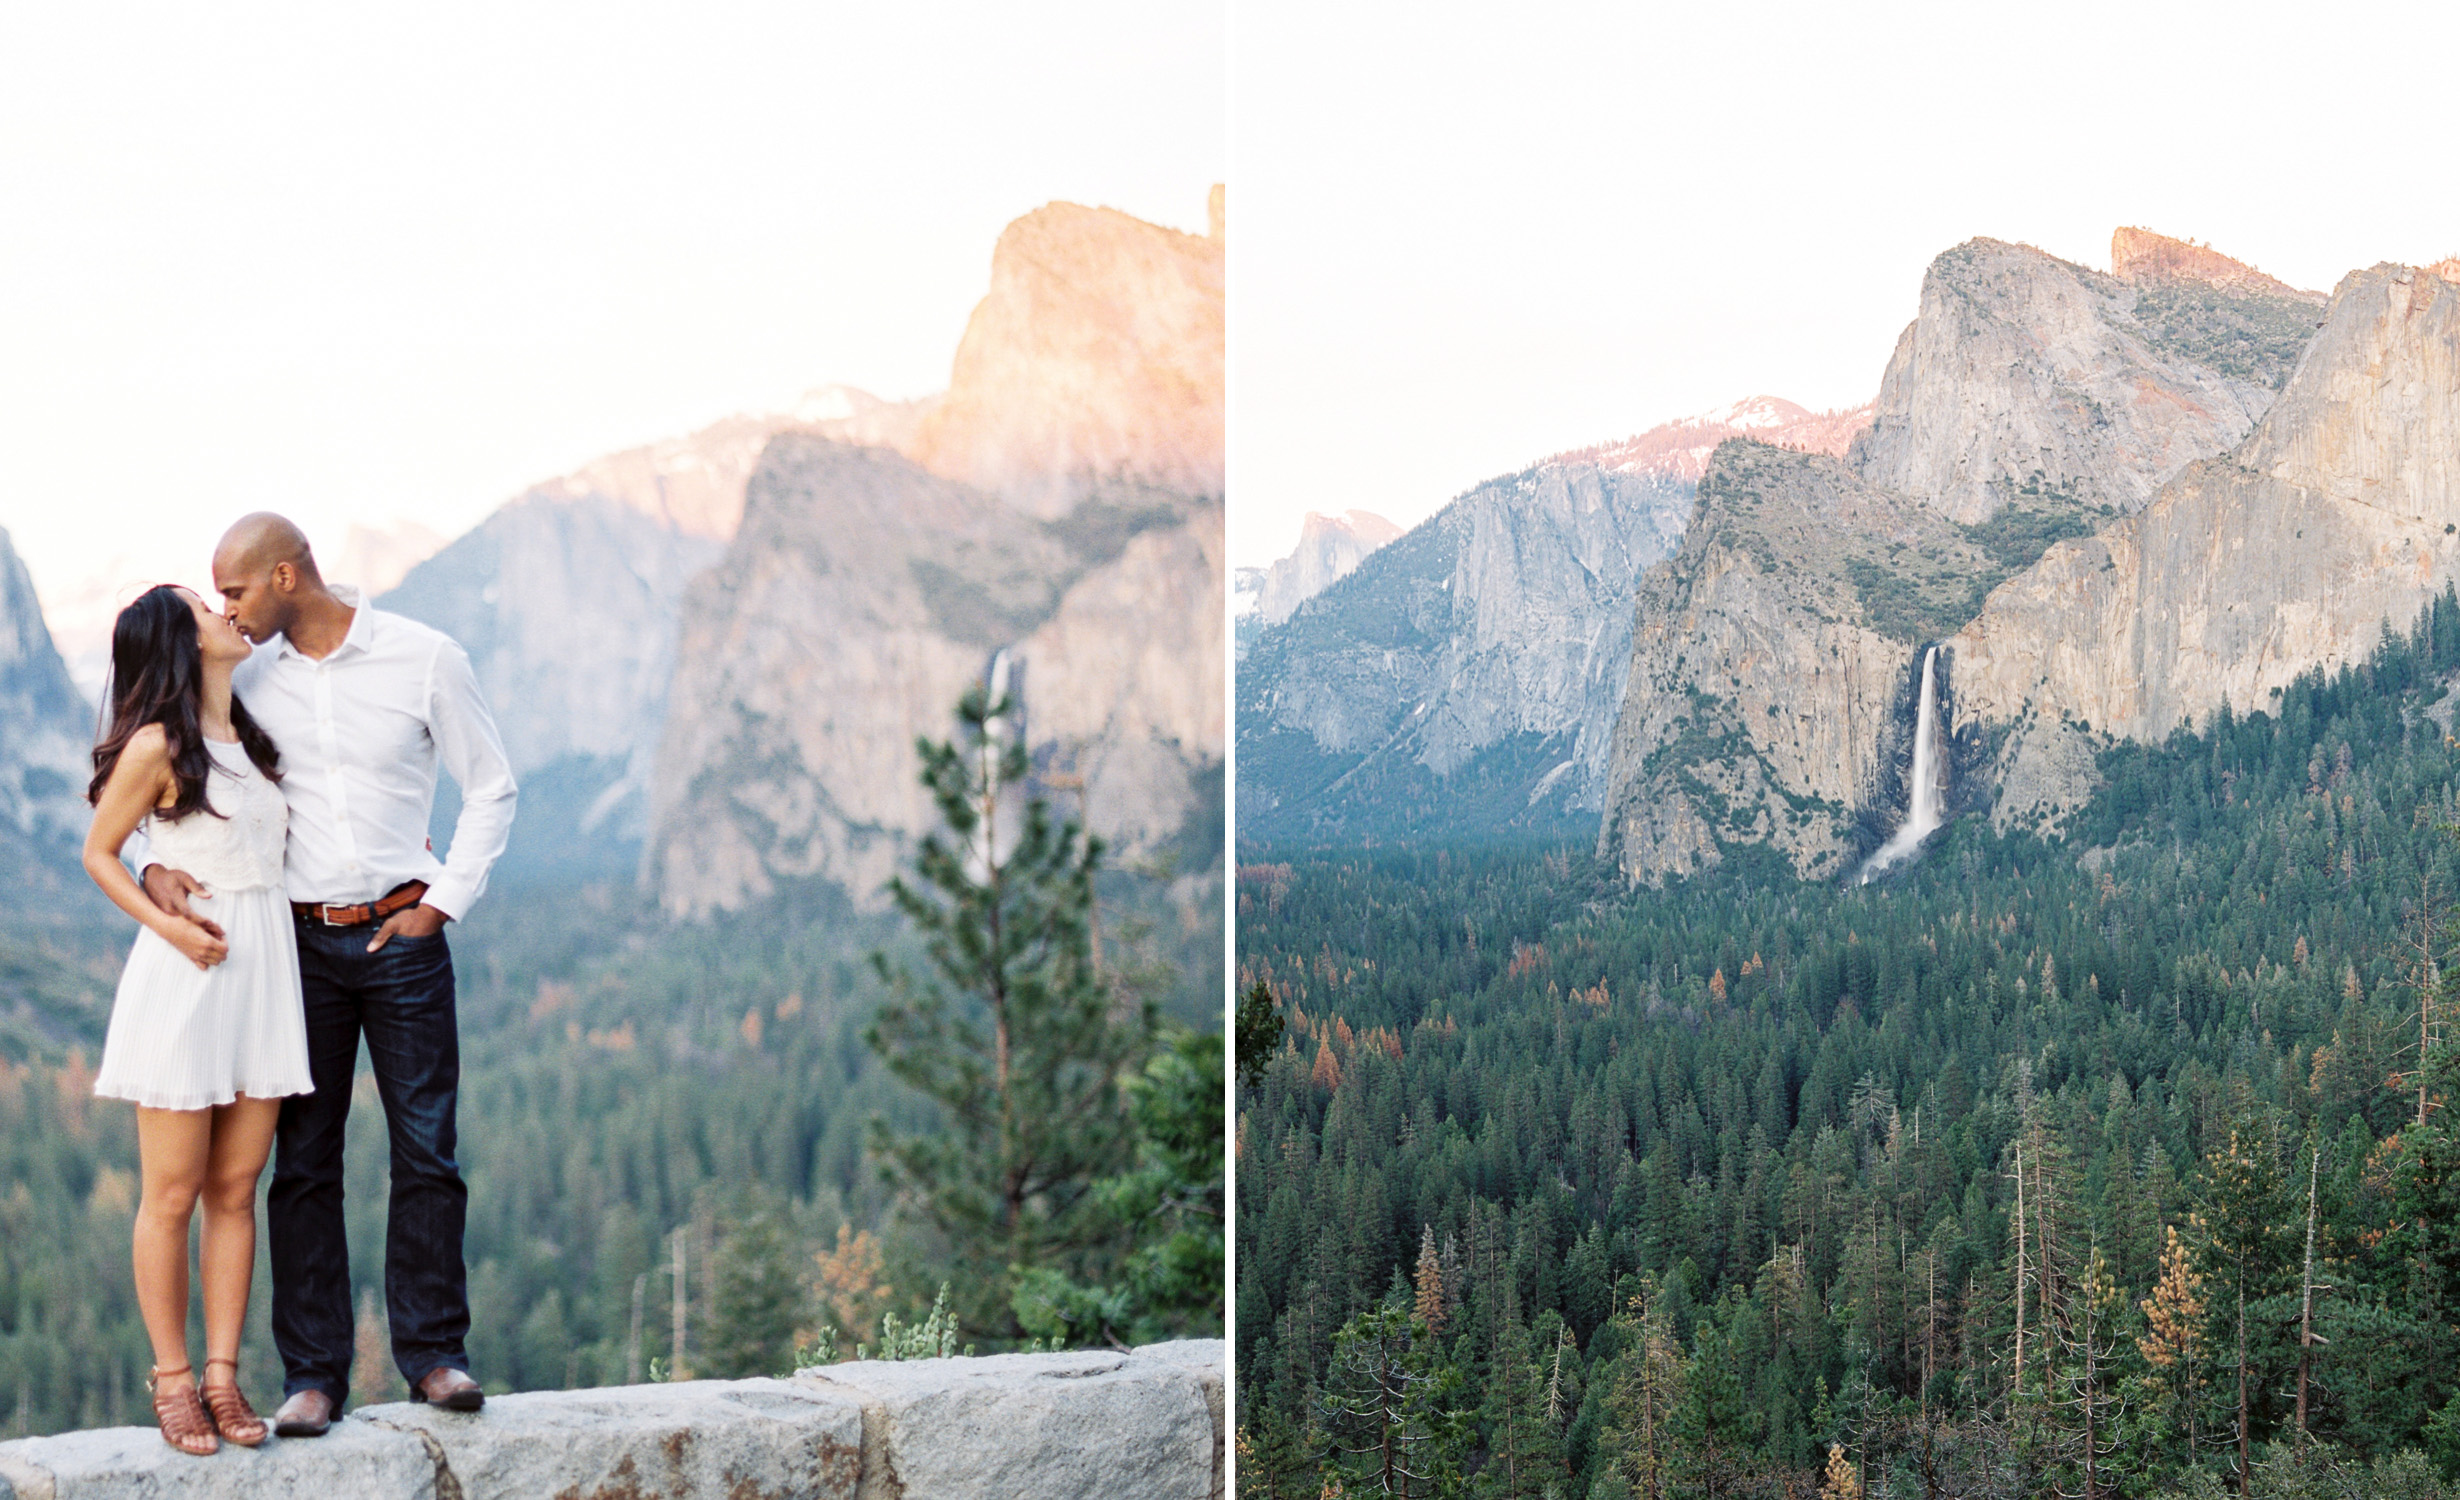 Yosemite-national-park-engagement-photography-film.jpg